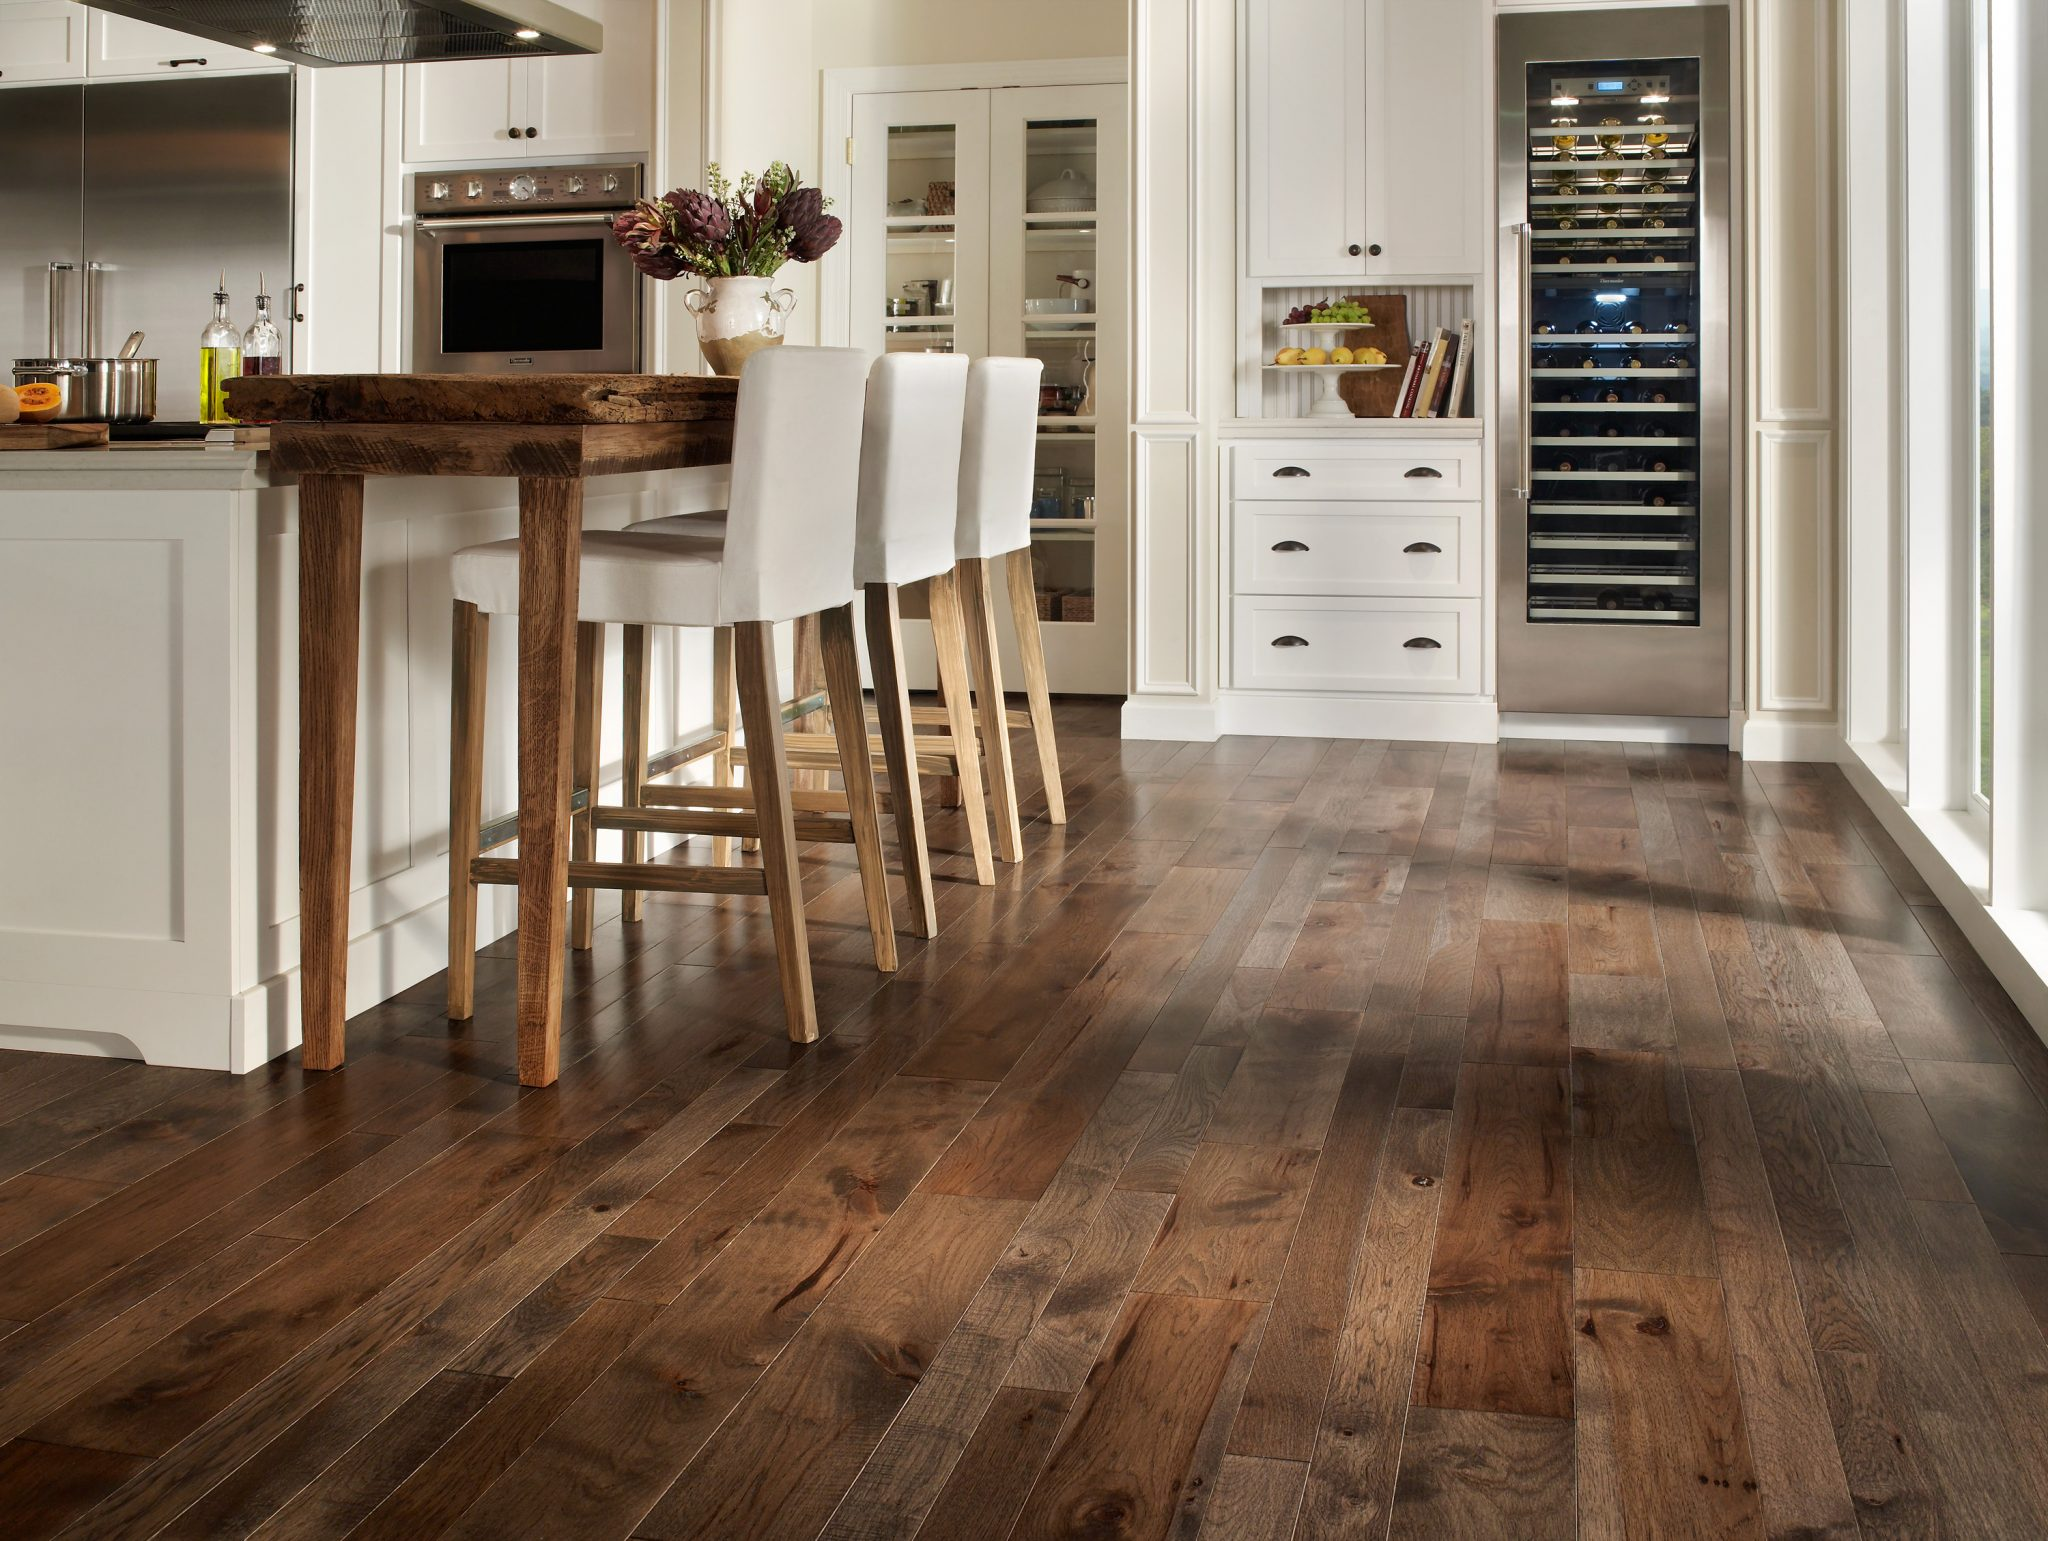 Should I Use Hardwood Floor in My Kitchen